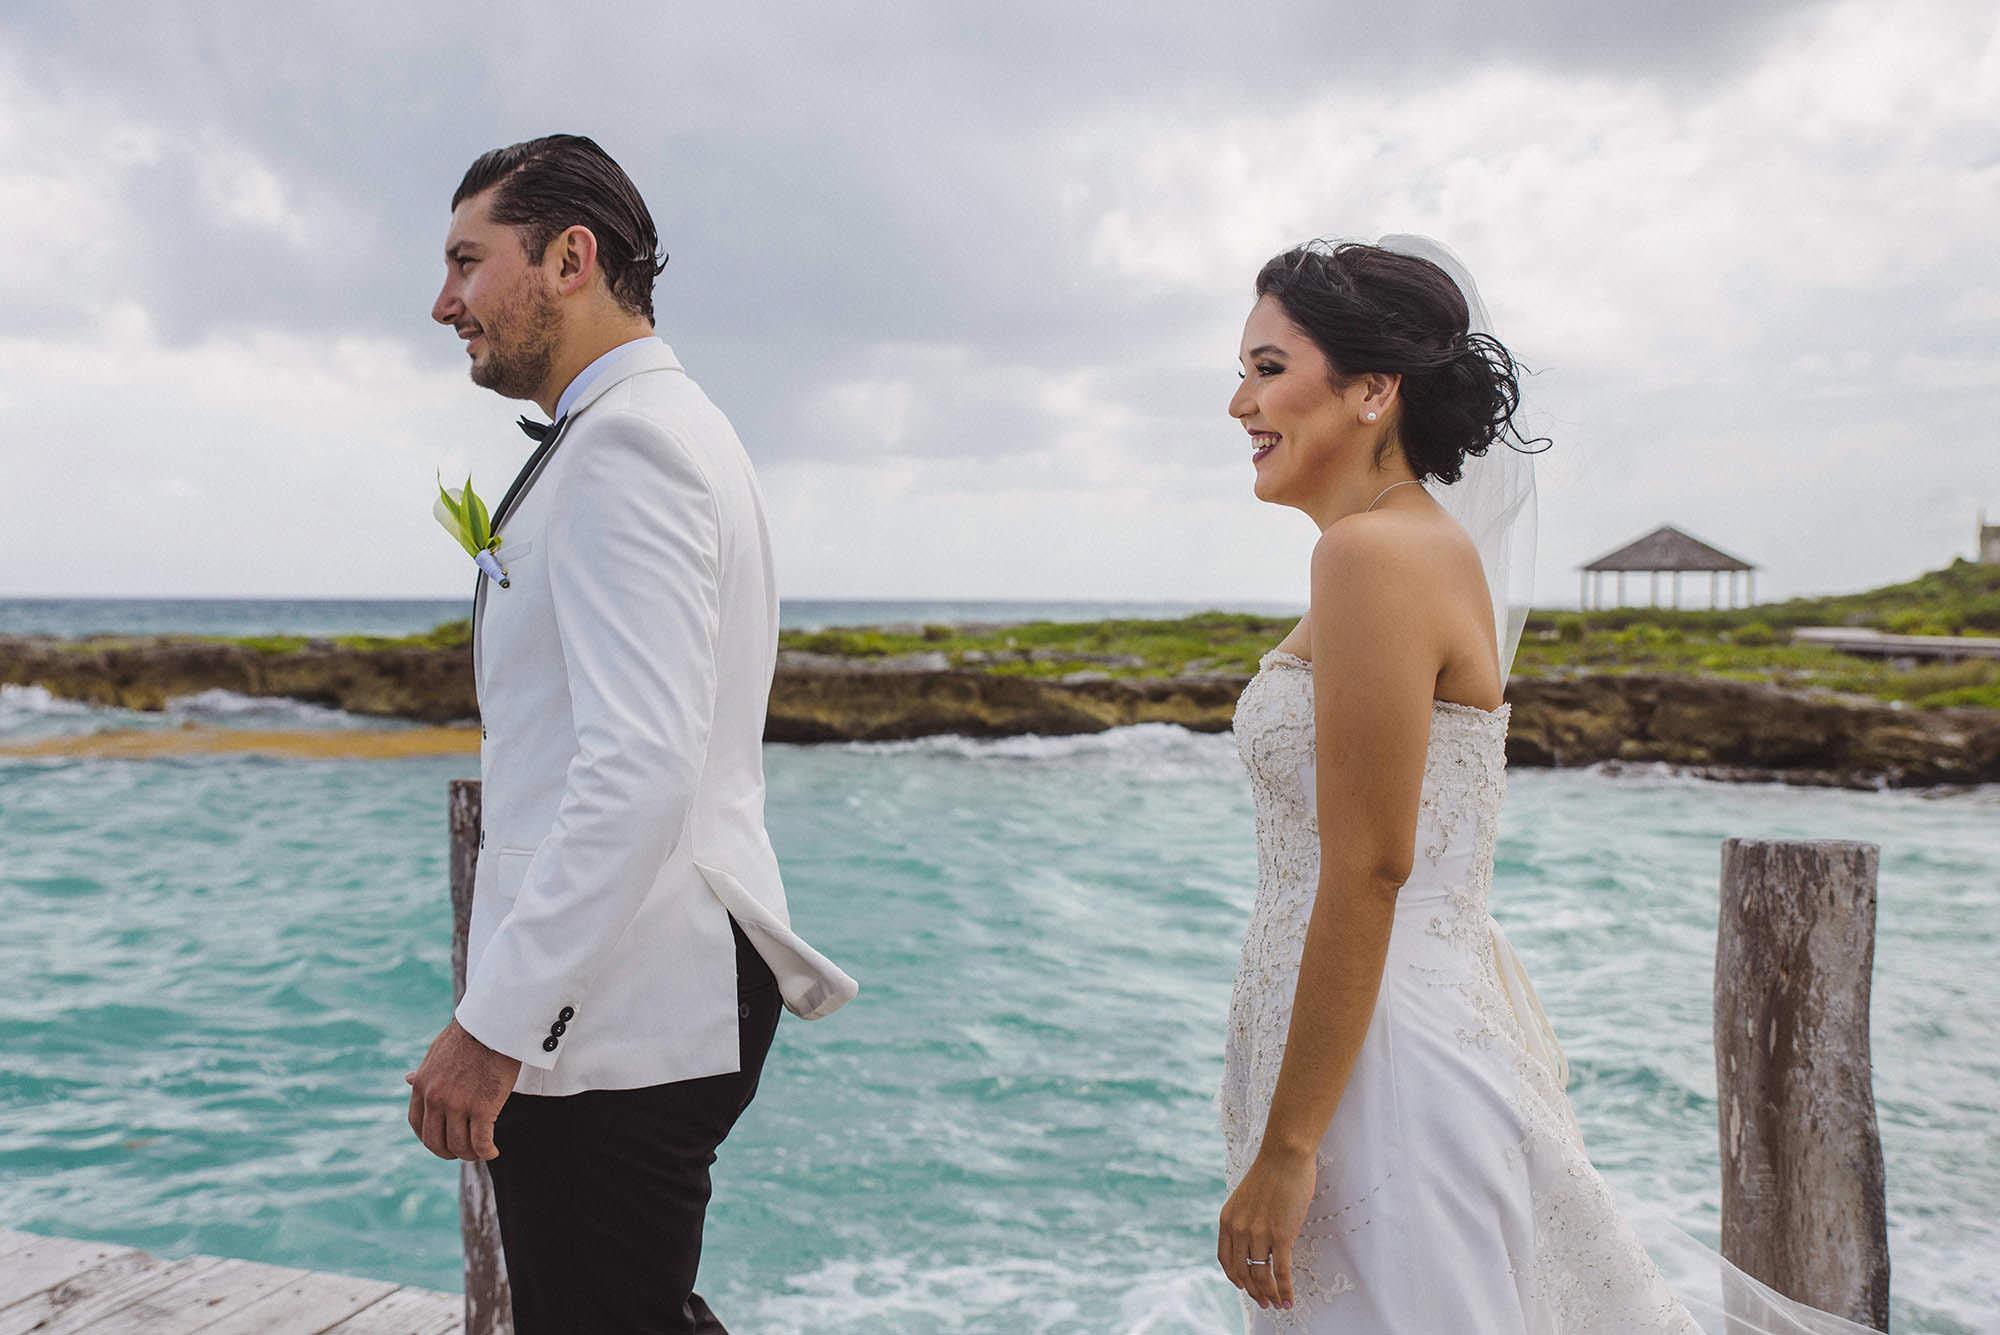 Wedding playa del carmen planner destination mexico magali espinosa19-WEB.jpg